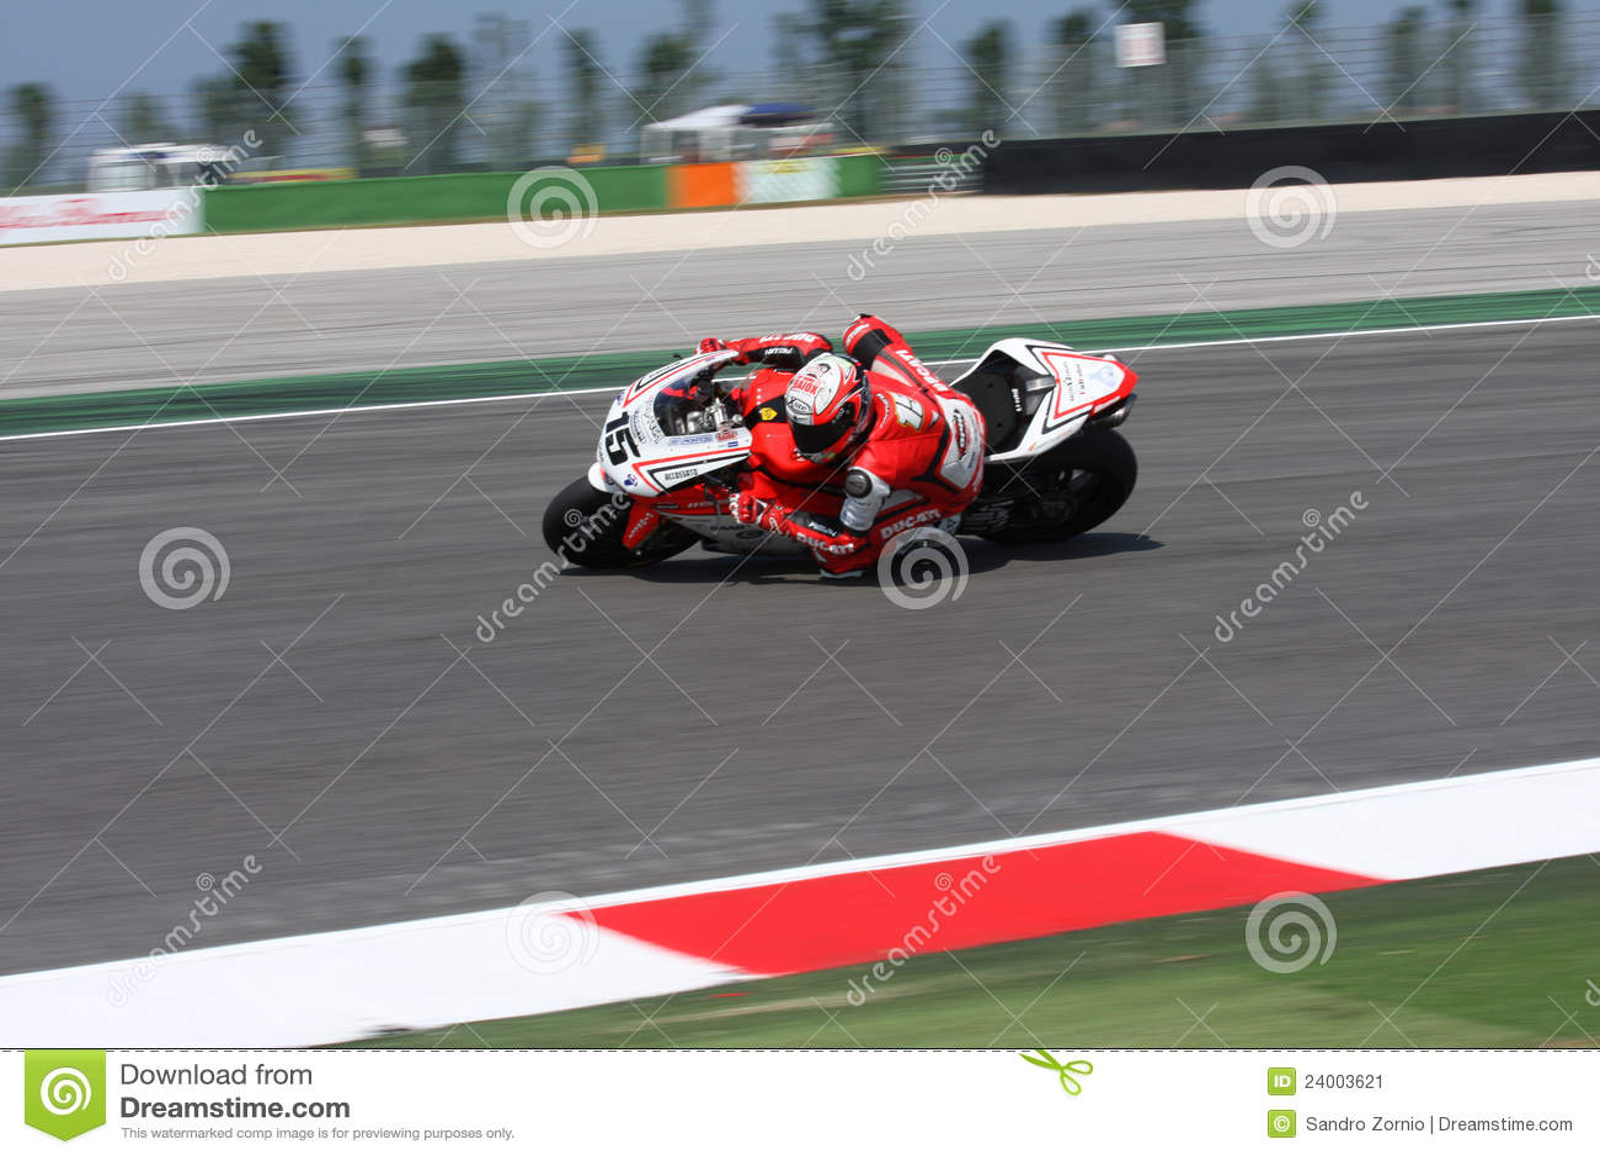 Matteo Baiocco Ducati 1098R Barni Racing Team